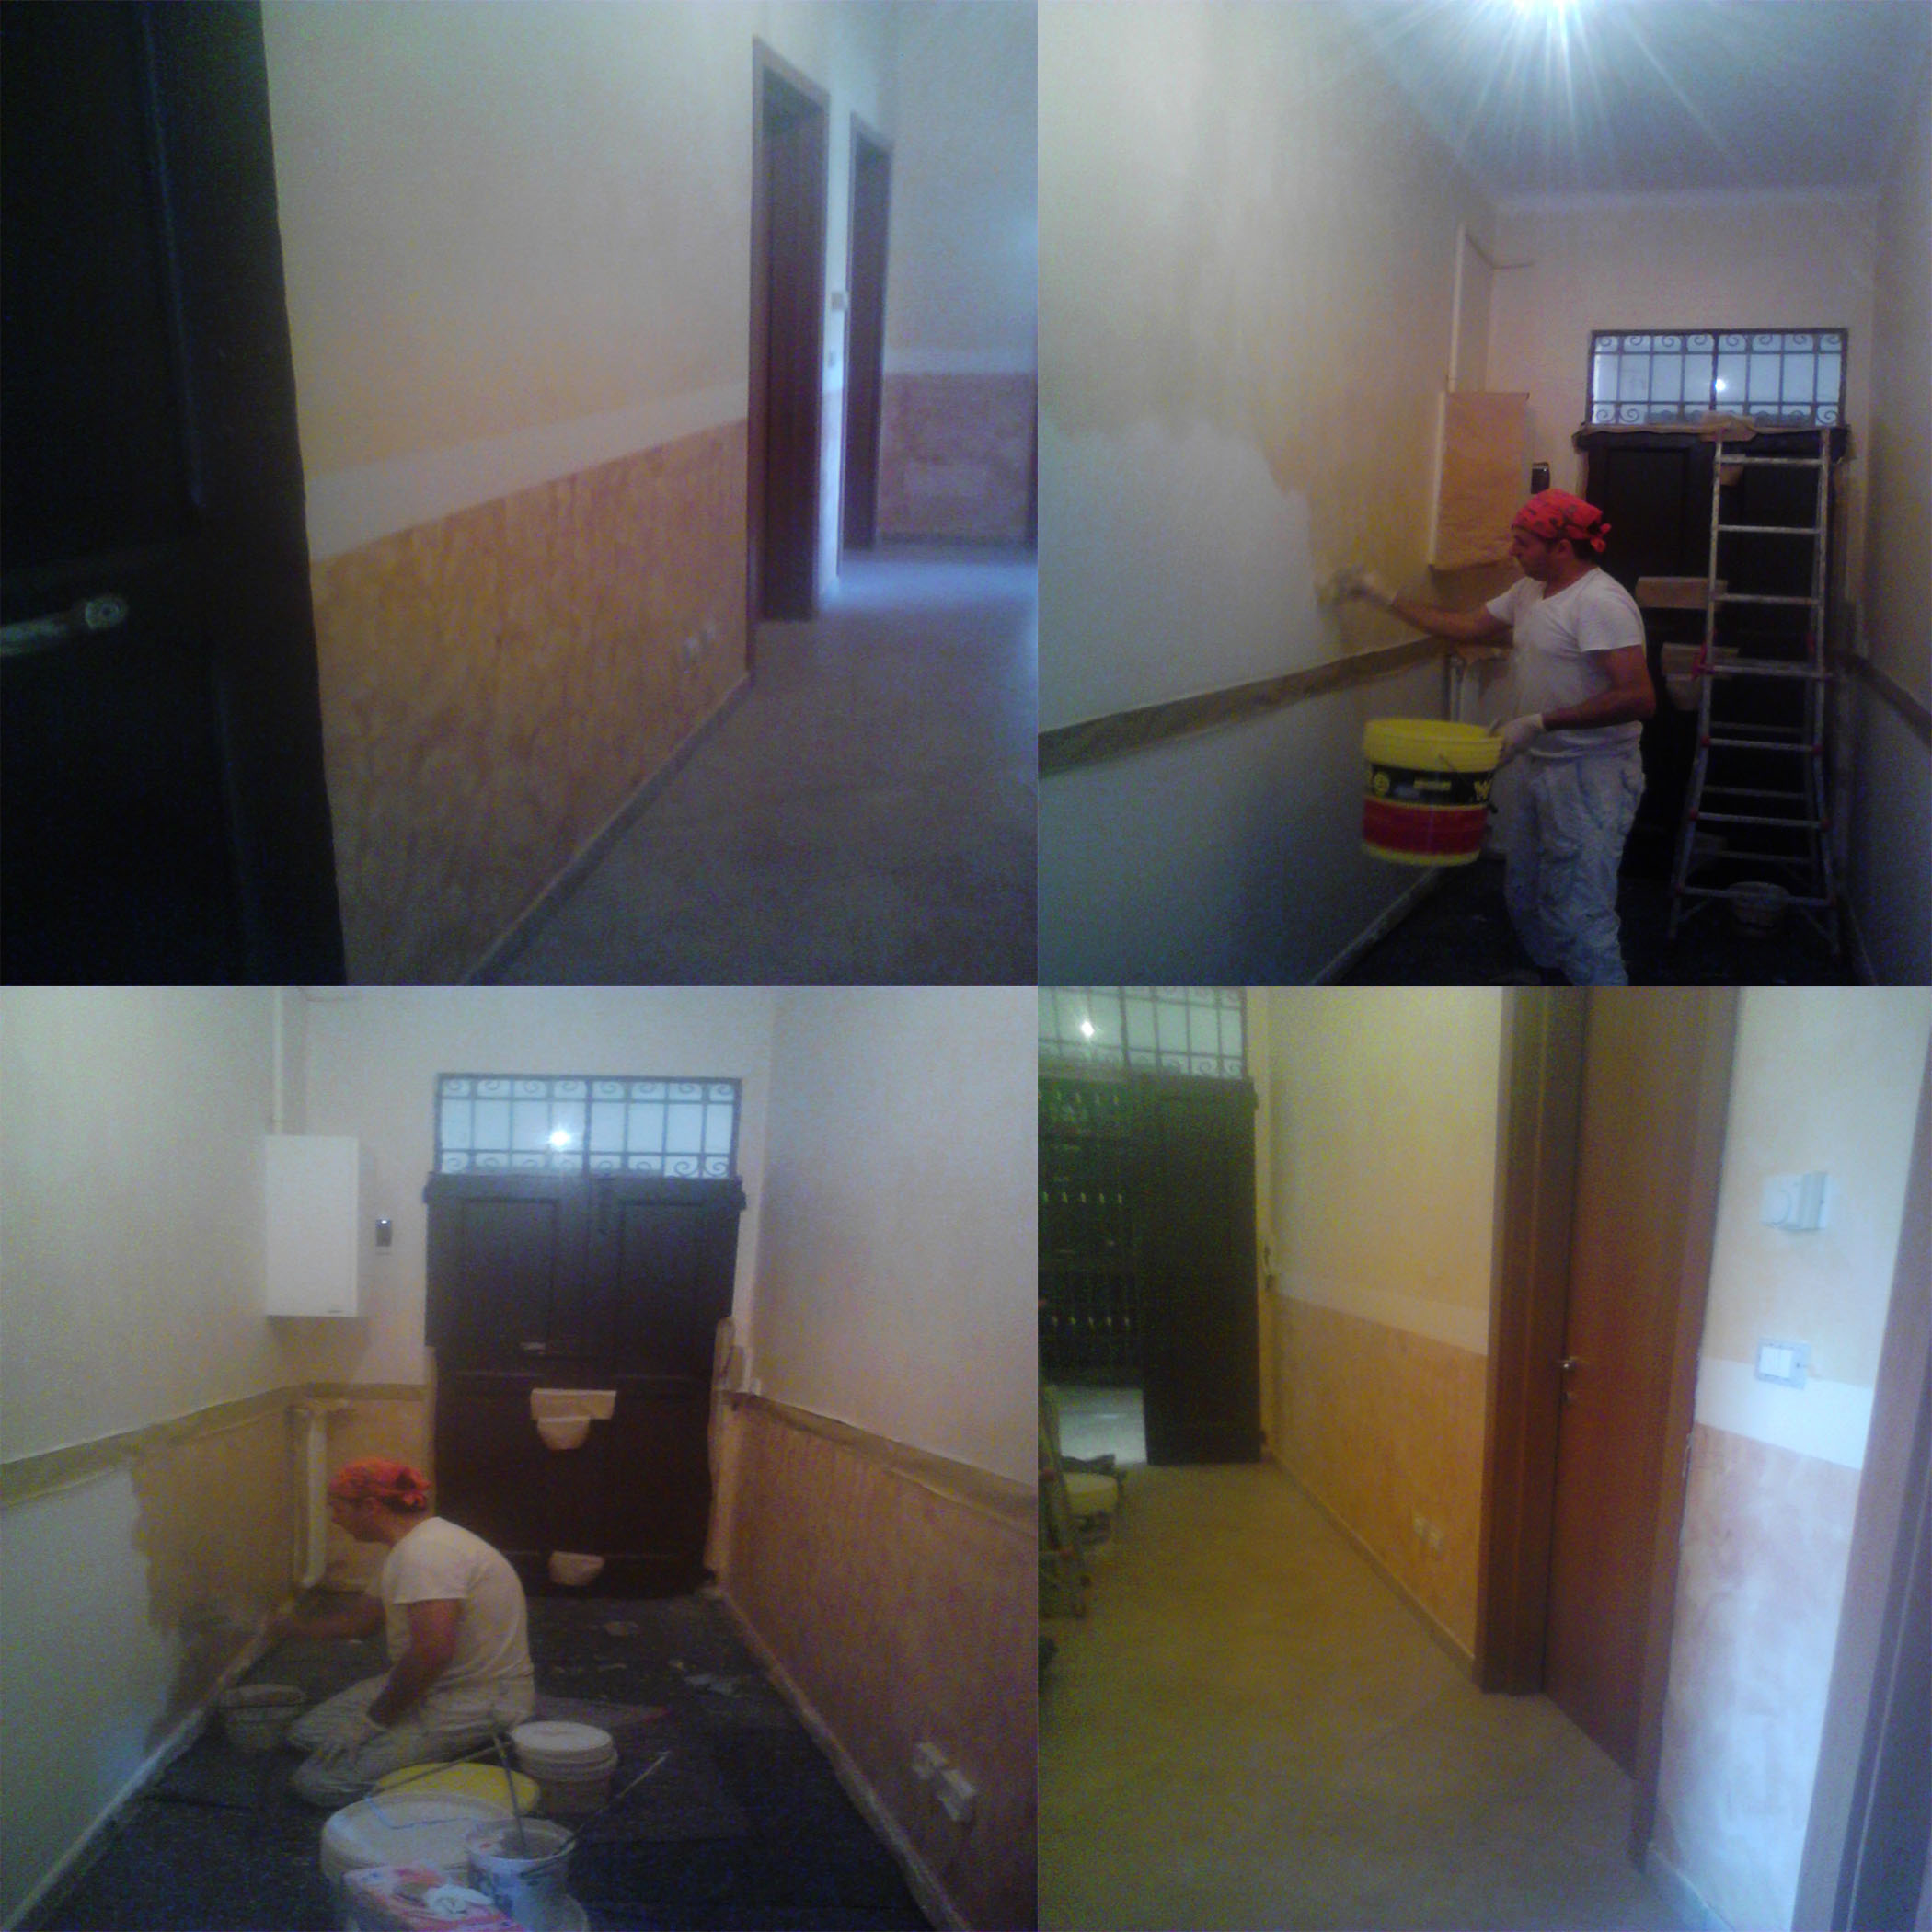 Decorazioni per interni decorazioni per interni with - Decorazioni per interni casa ...